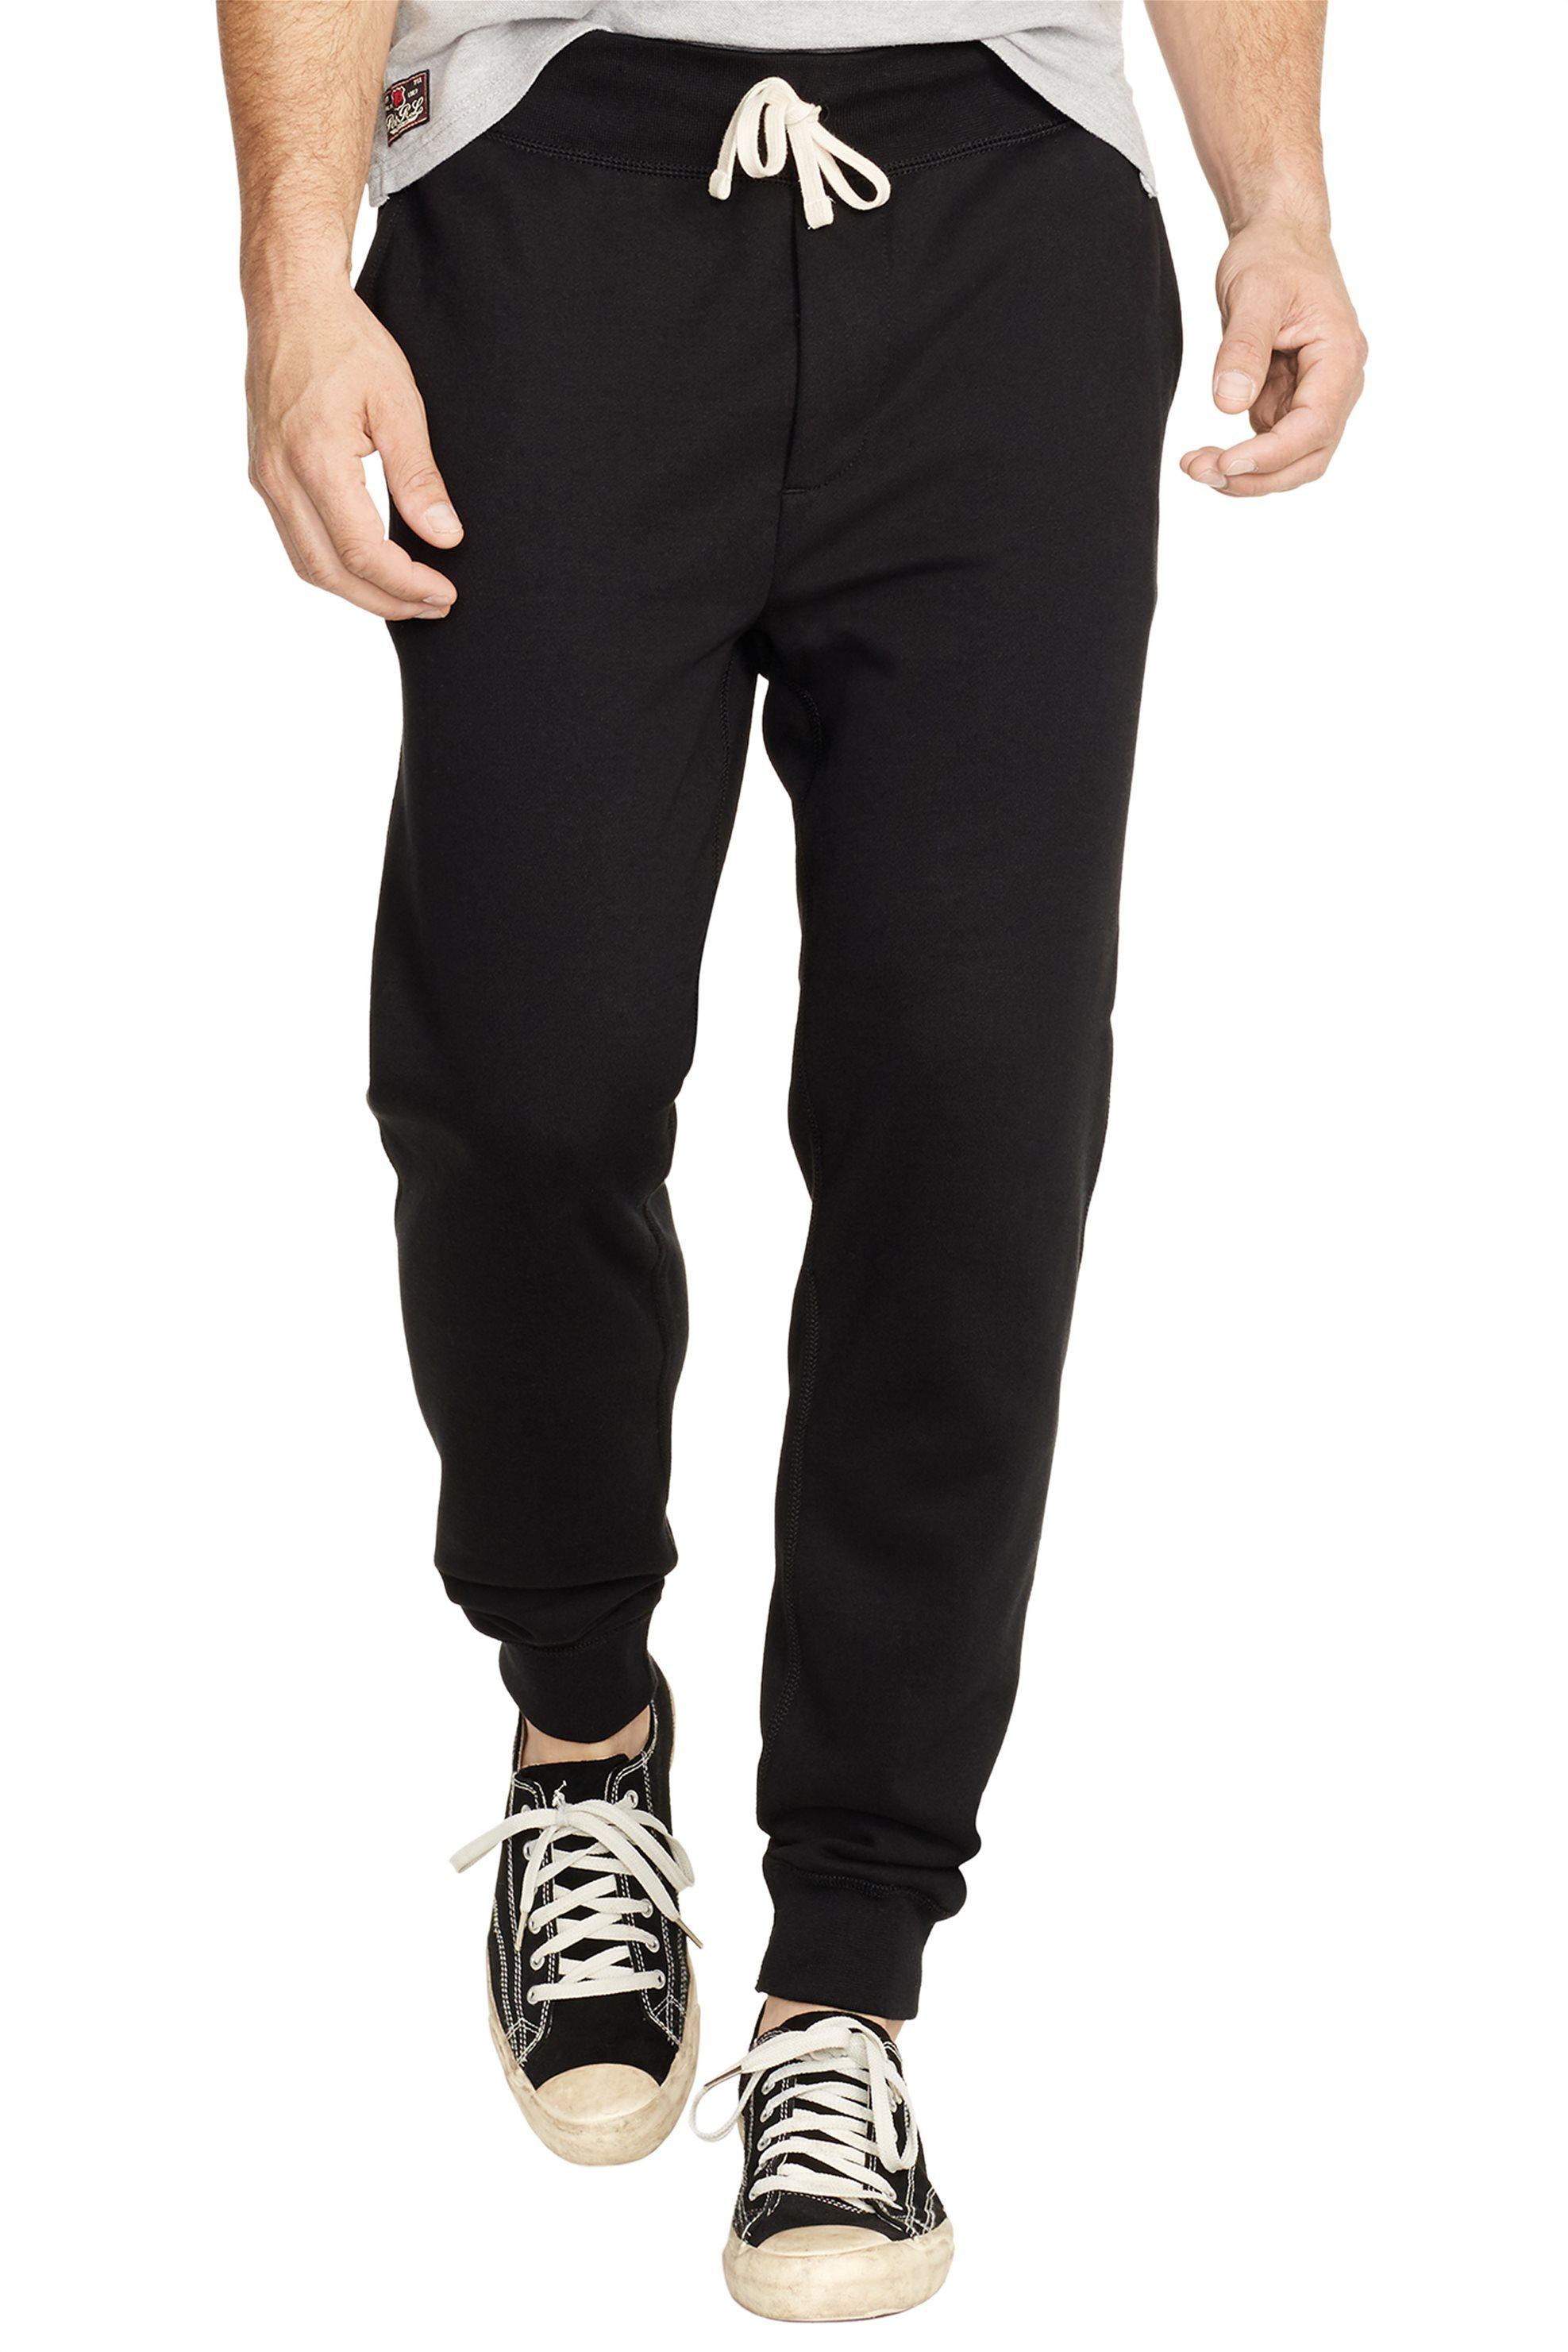 Polo Ralph Lauren ανδρικό μαύρο παντελόνι φόρμας - 710600105001 - Μαύρο ανδρασ   ρουχα   παντελόνια   φόρμες